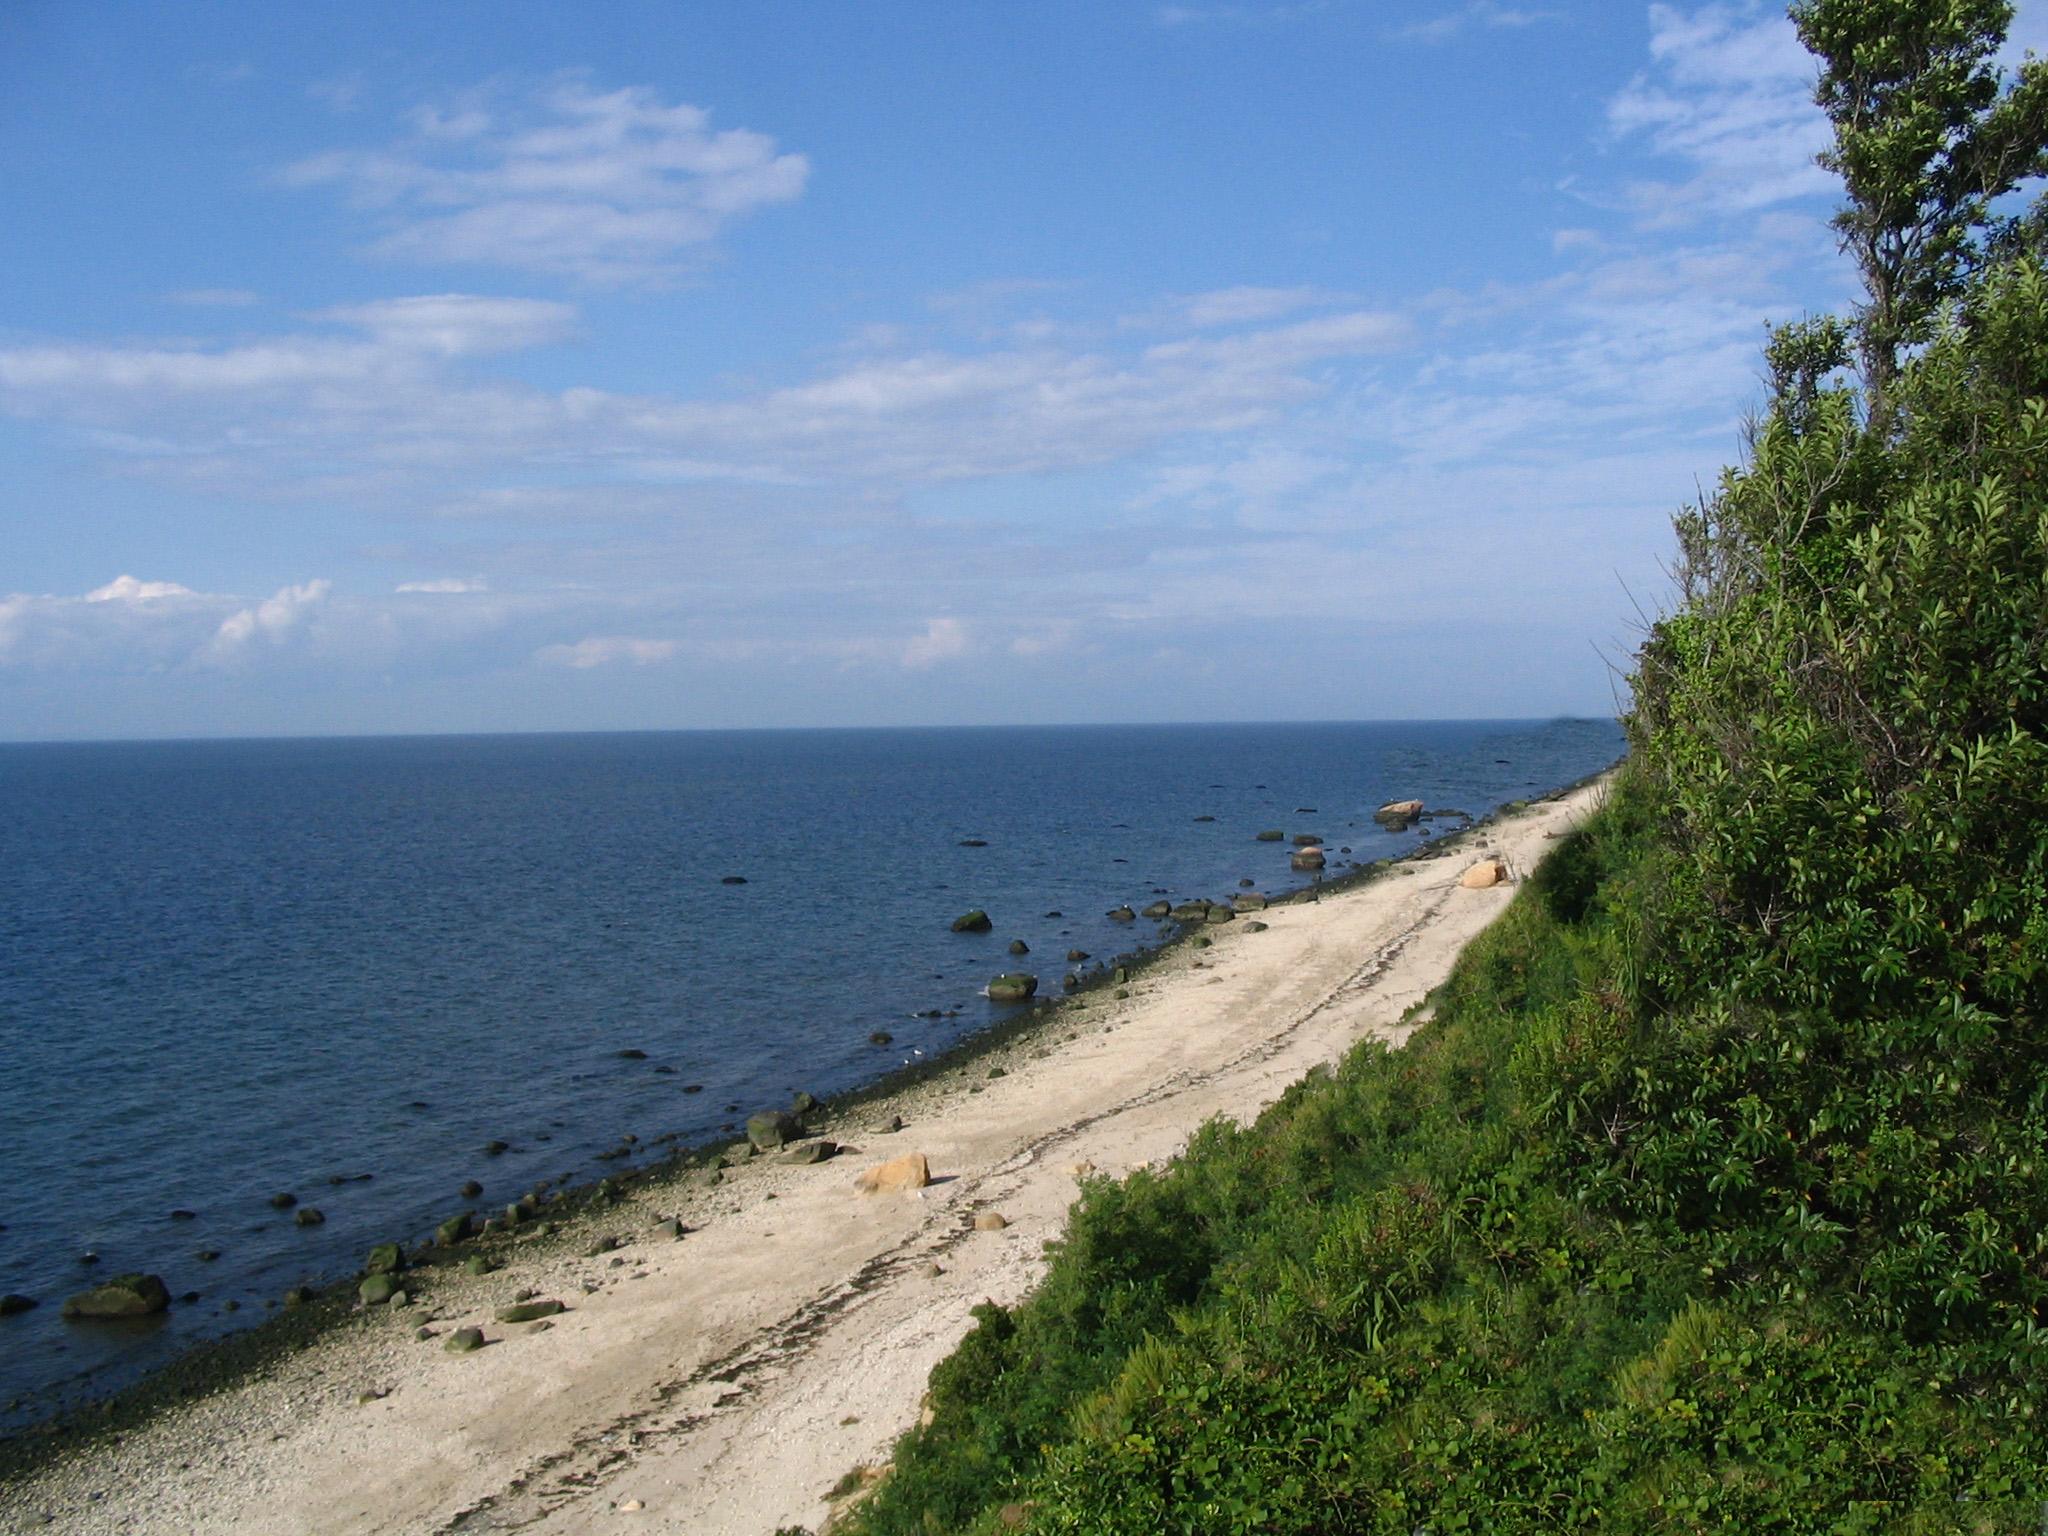 Beach%20shot%20edited